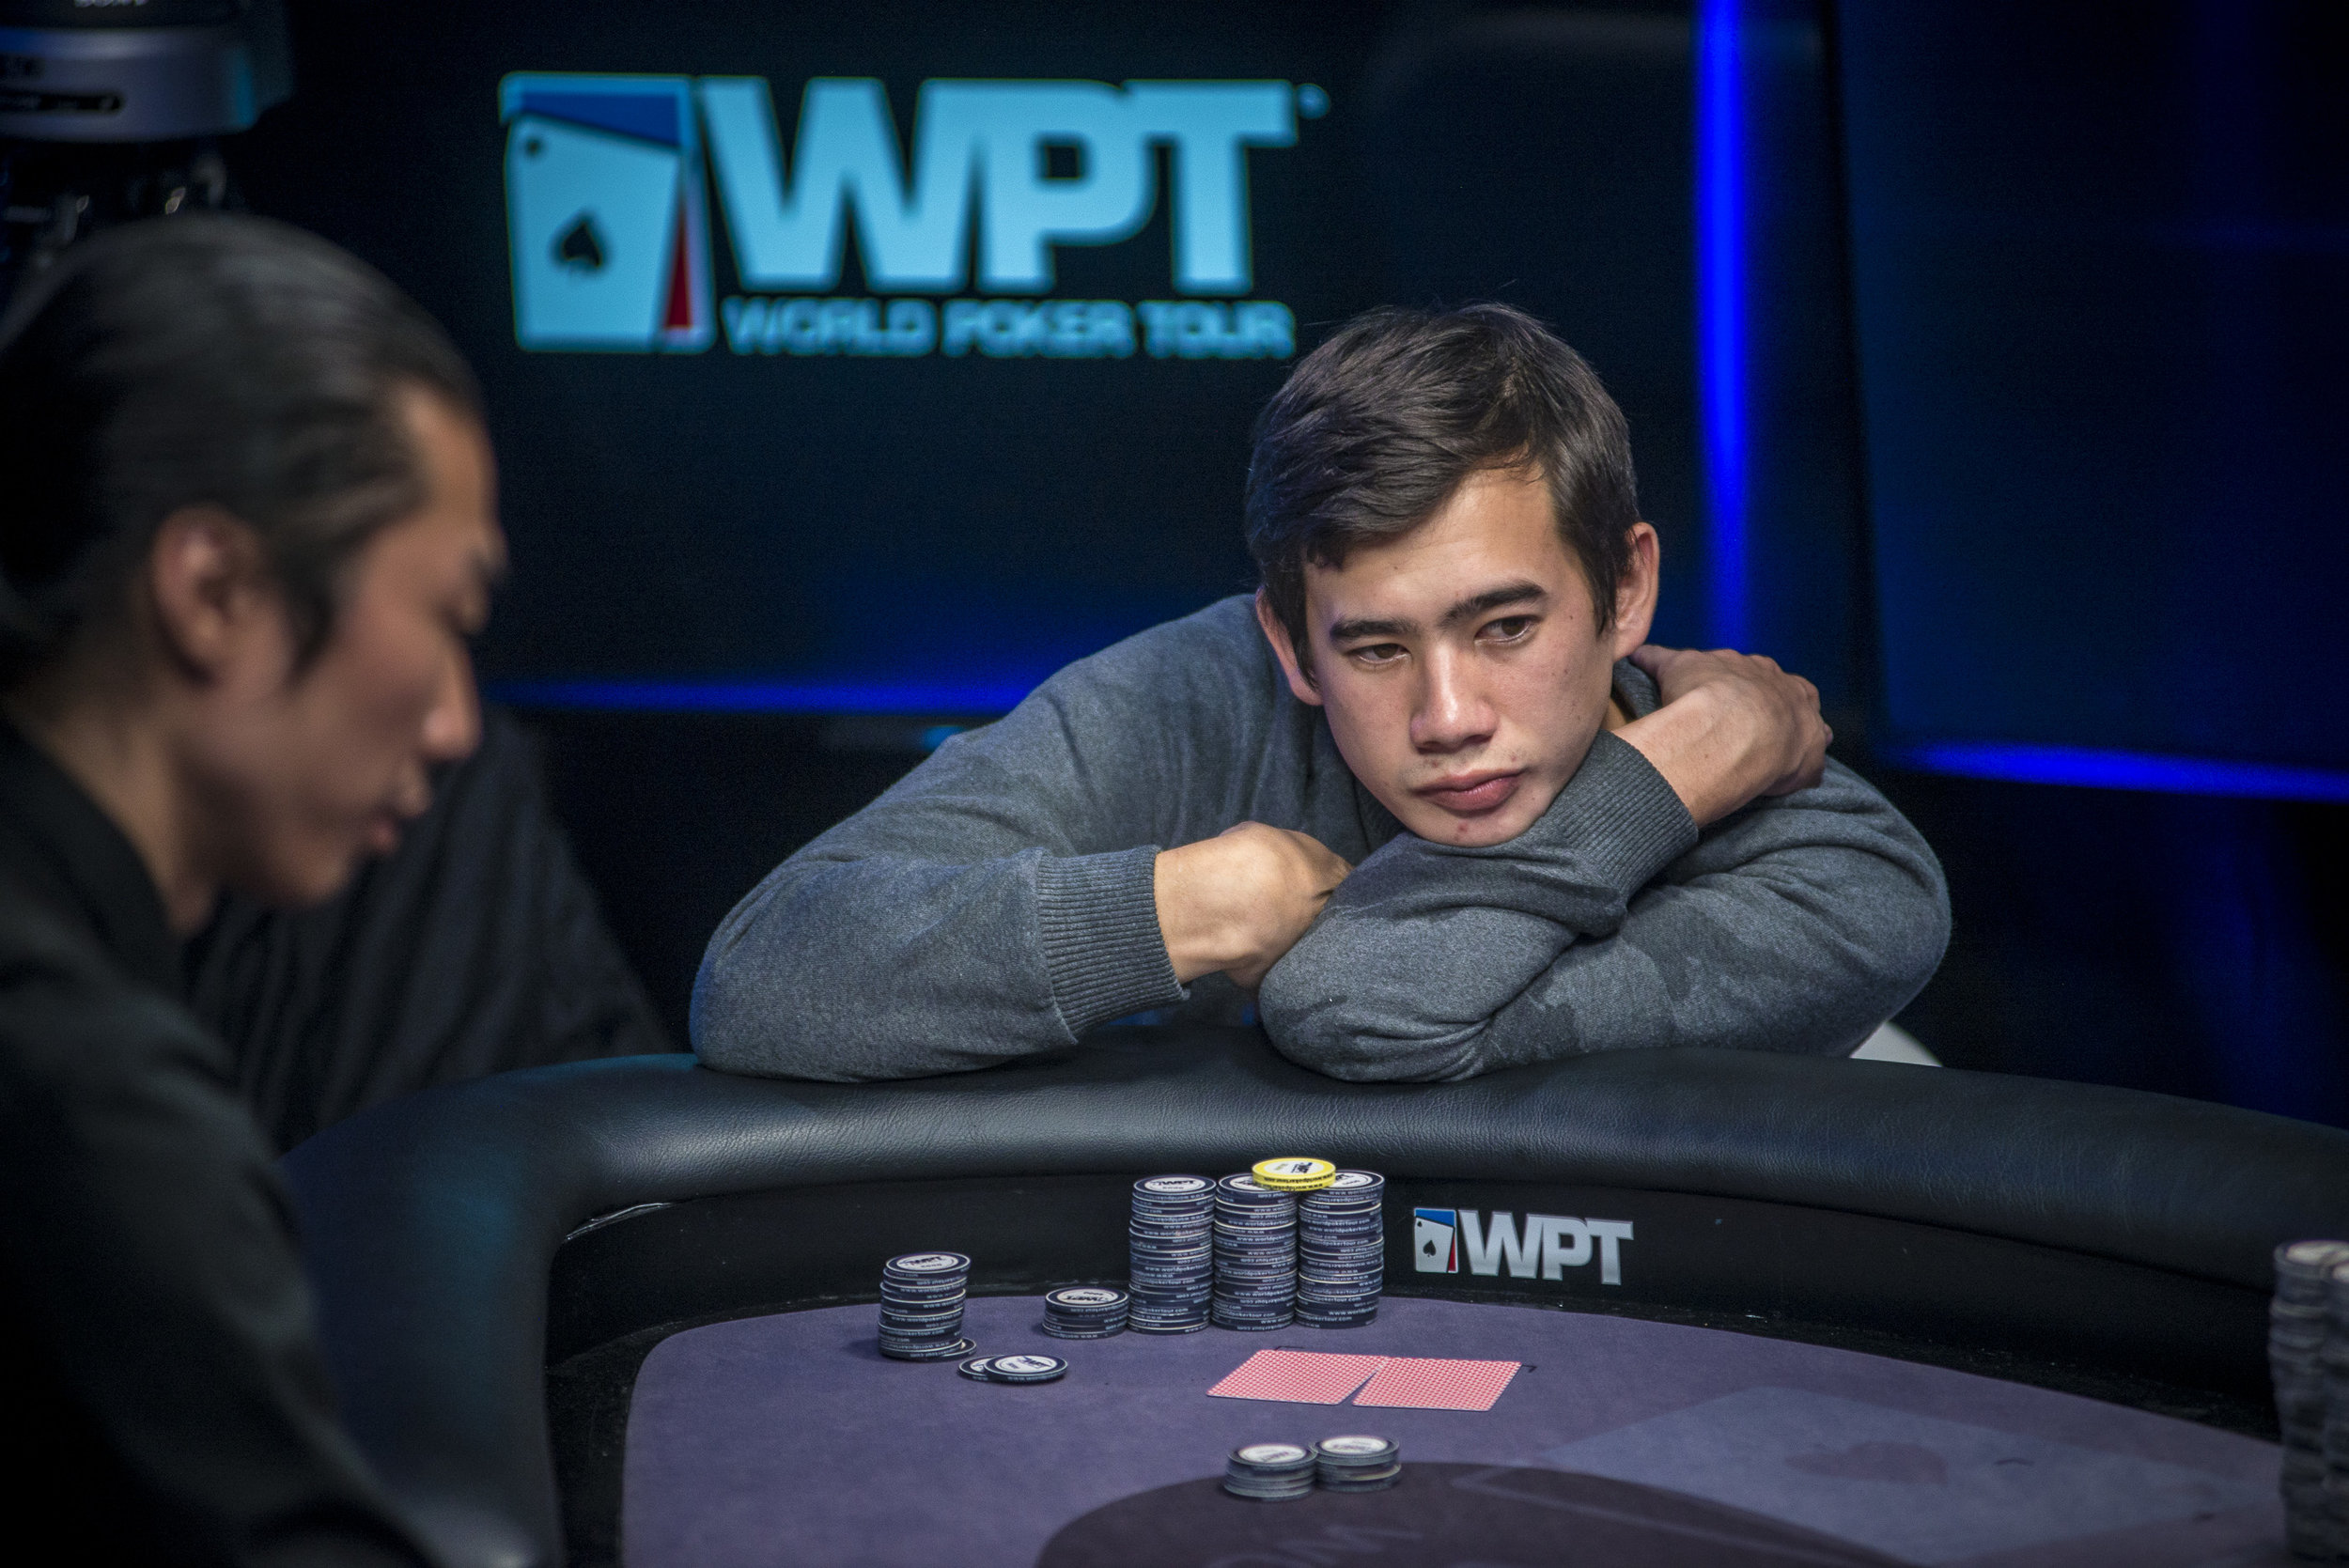 World Poker Tour_Louis Salter _DA64916.jpg